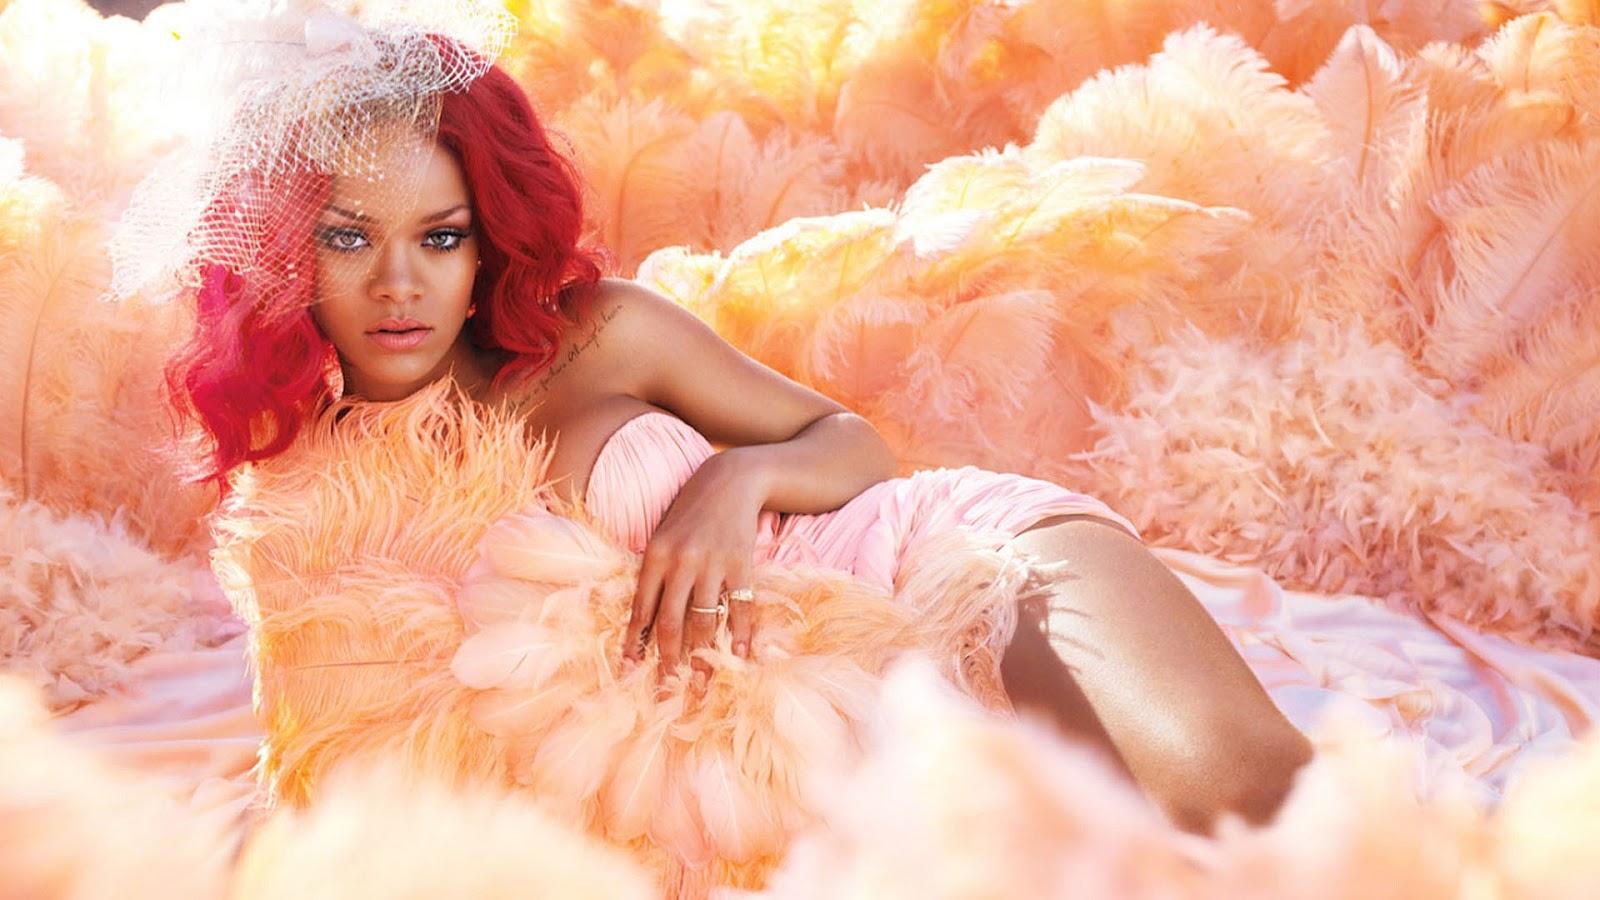 Rihanna Rihanna 1600x900